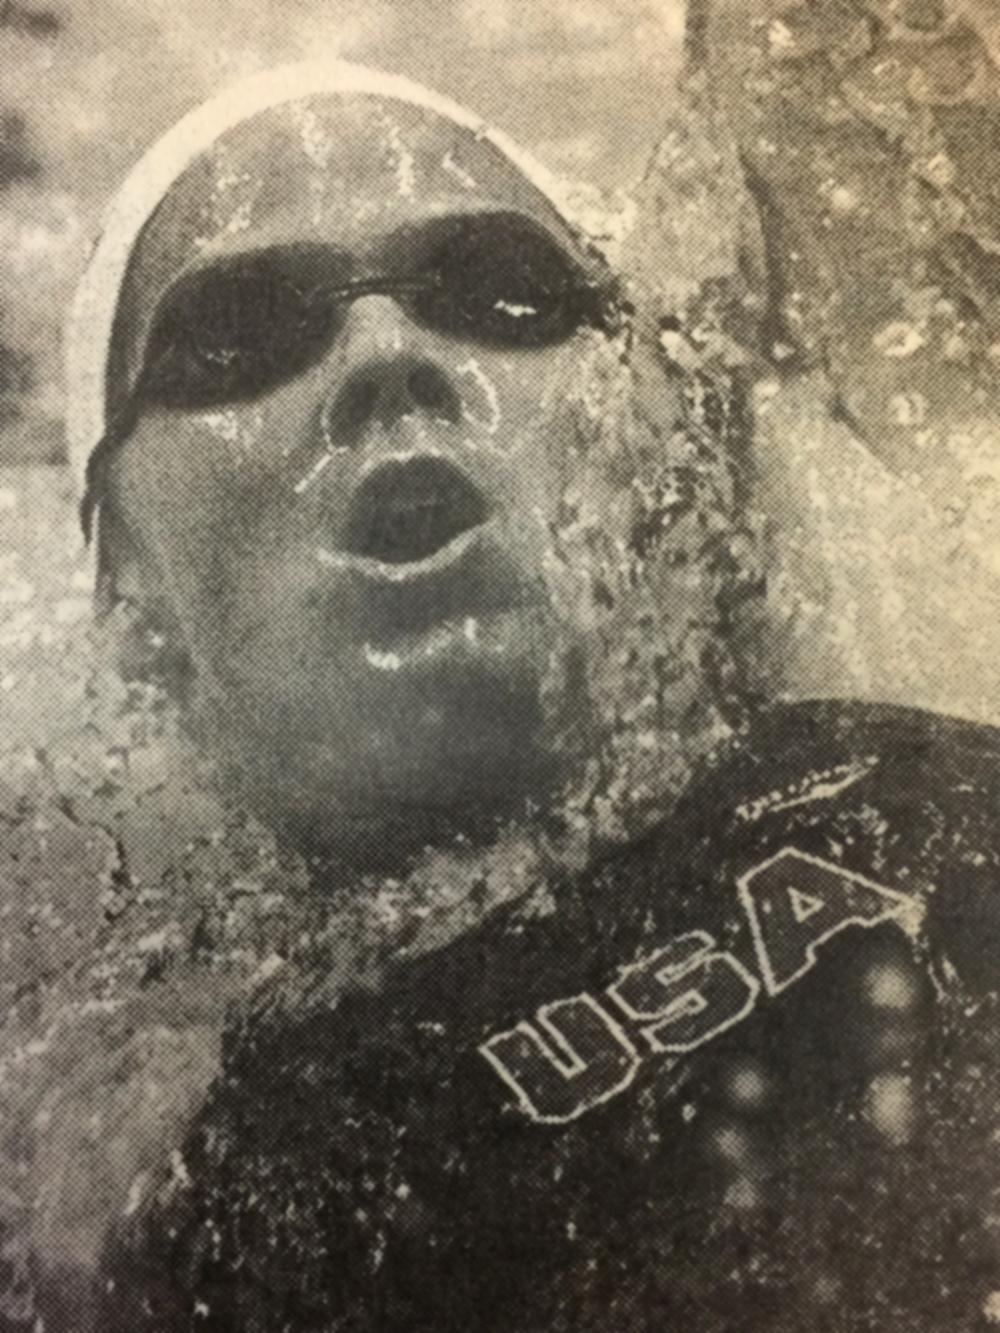 The international swim meet at the 1985 U.S. Open, in Austin, TX.